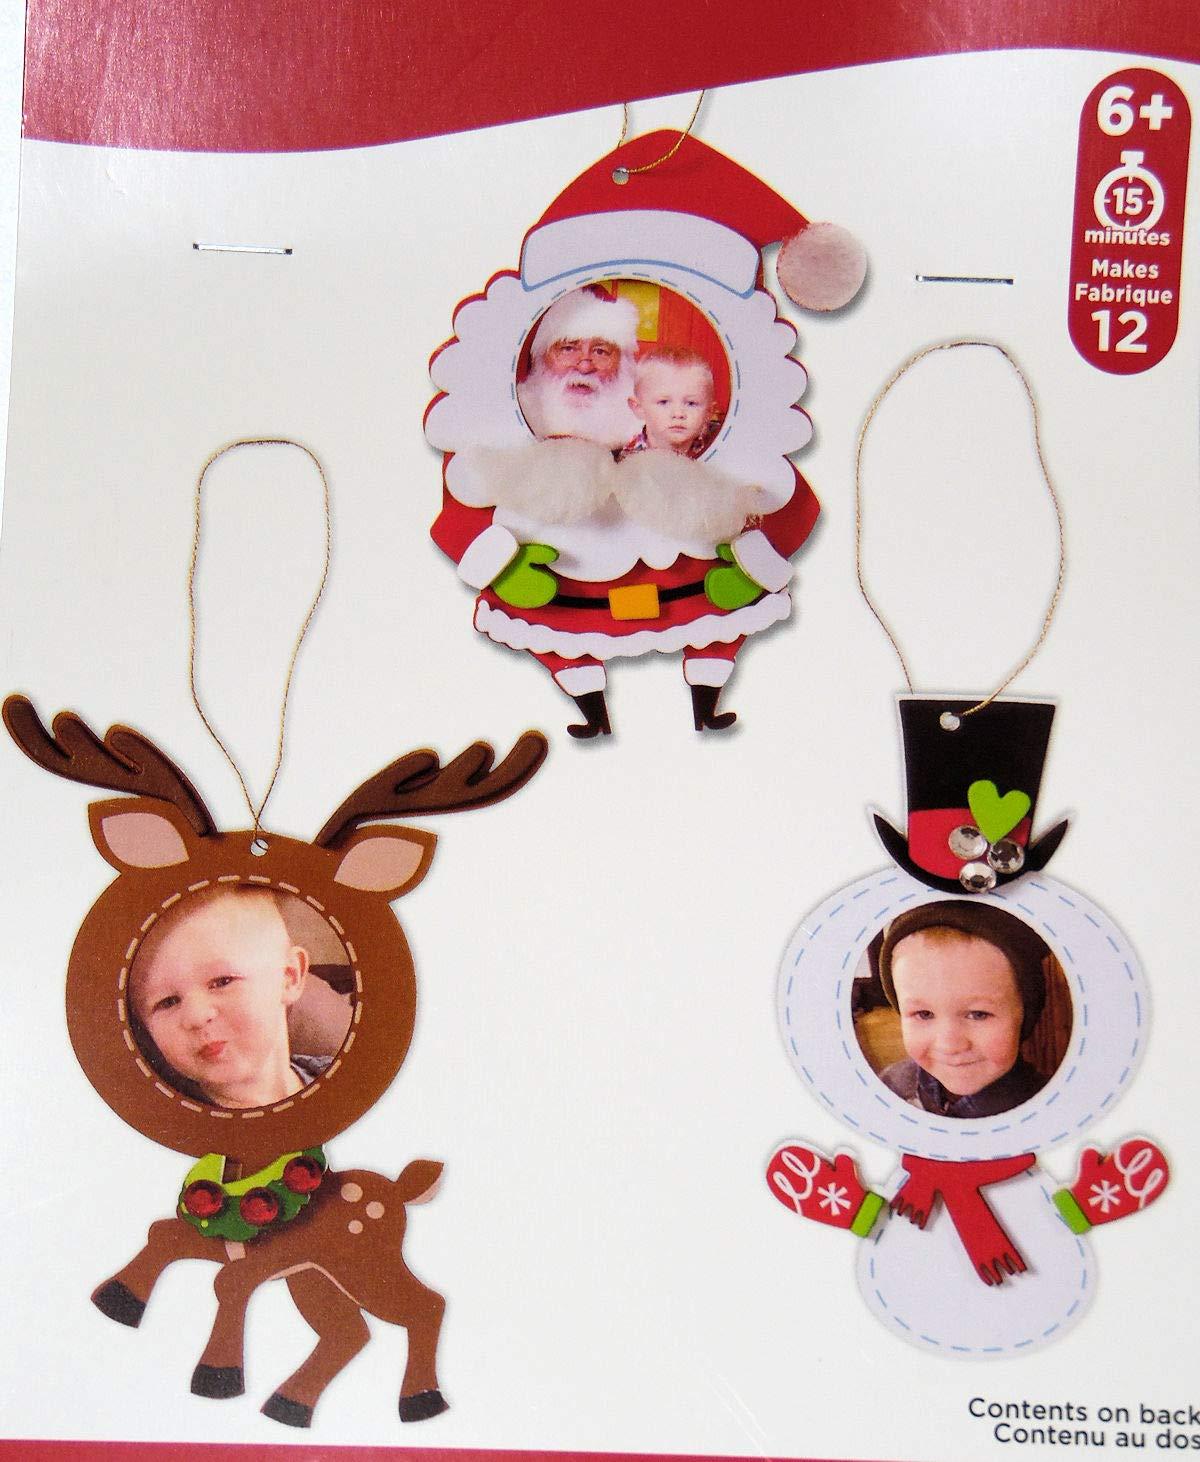 Christmas Photo Frame Ornaments Craft Fun Foam Kit - Holiday Makes 12 Ornaments Creatology